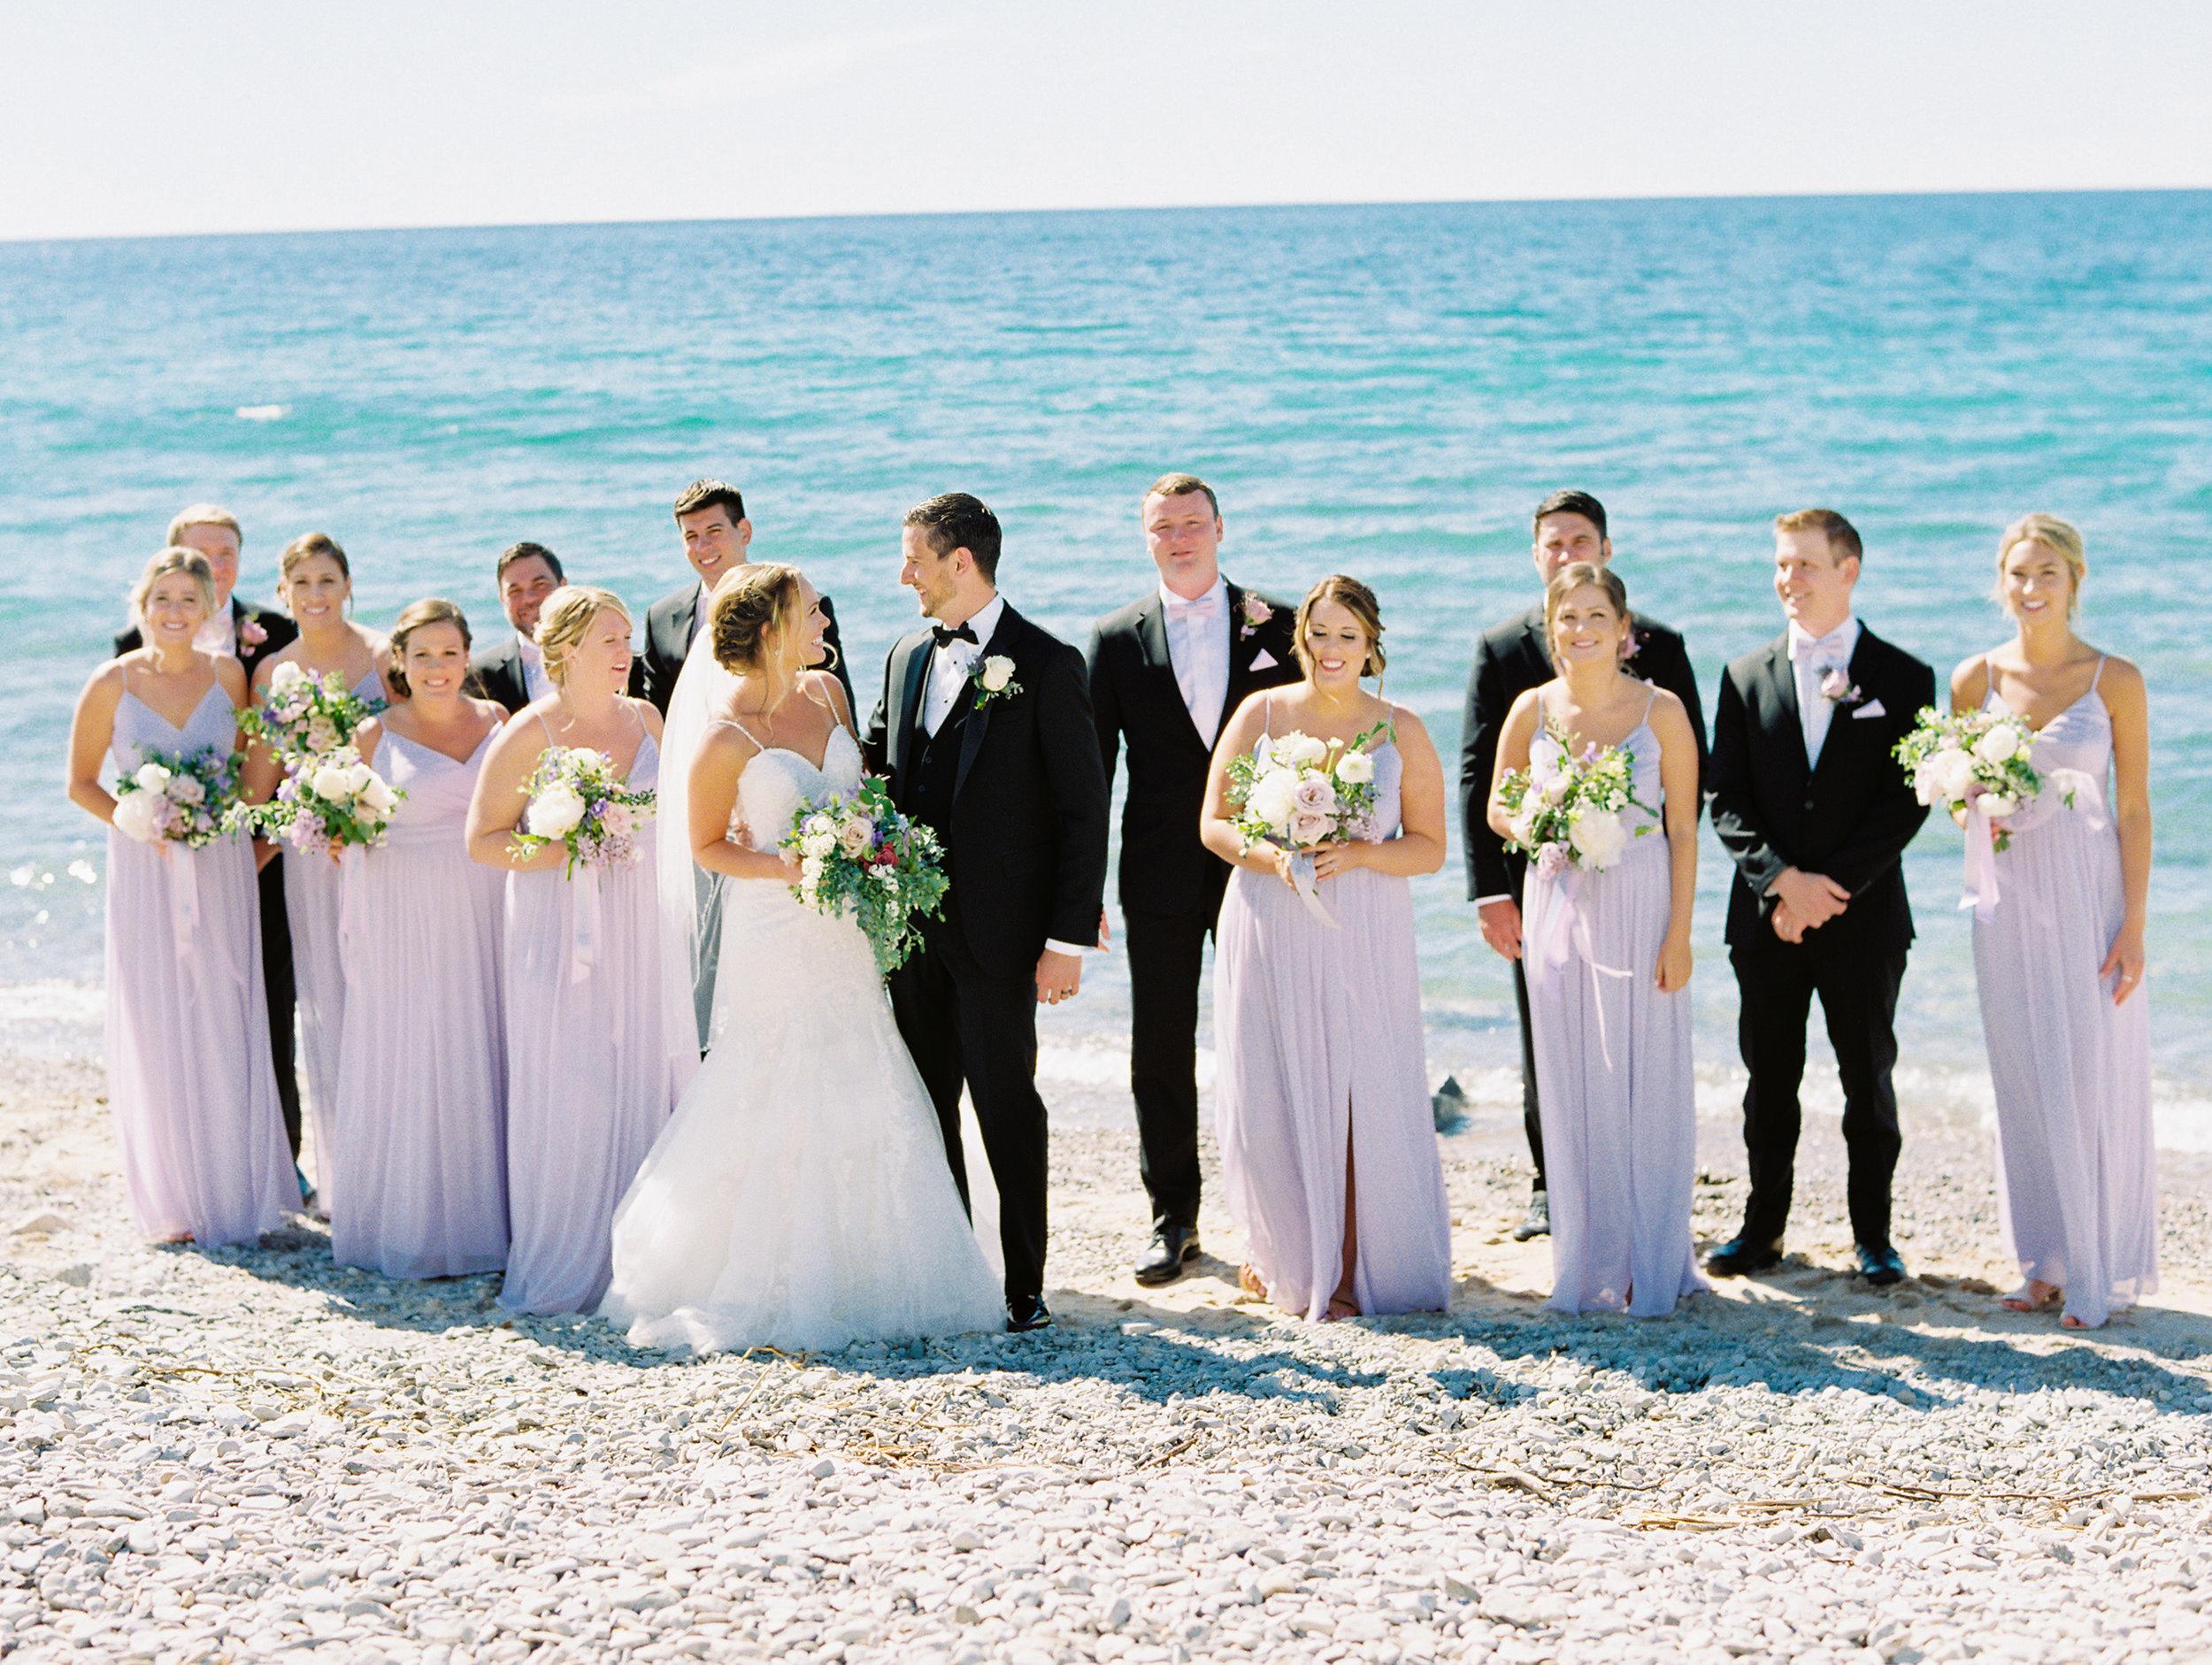 Noss+Wedding+Bridal+Party-28.jpg